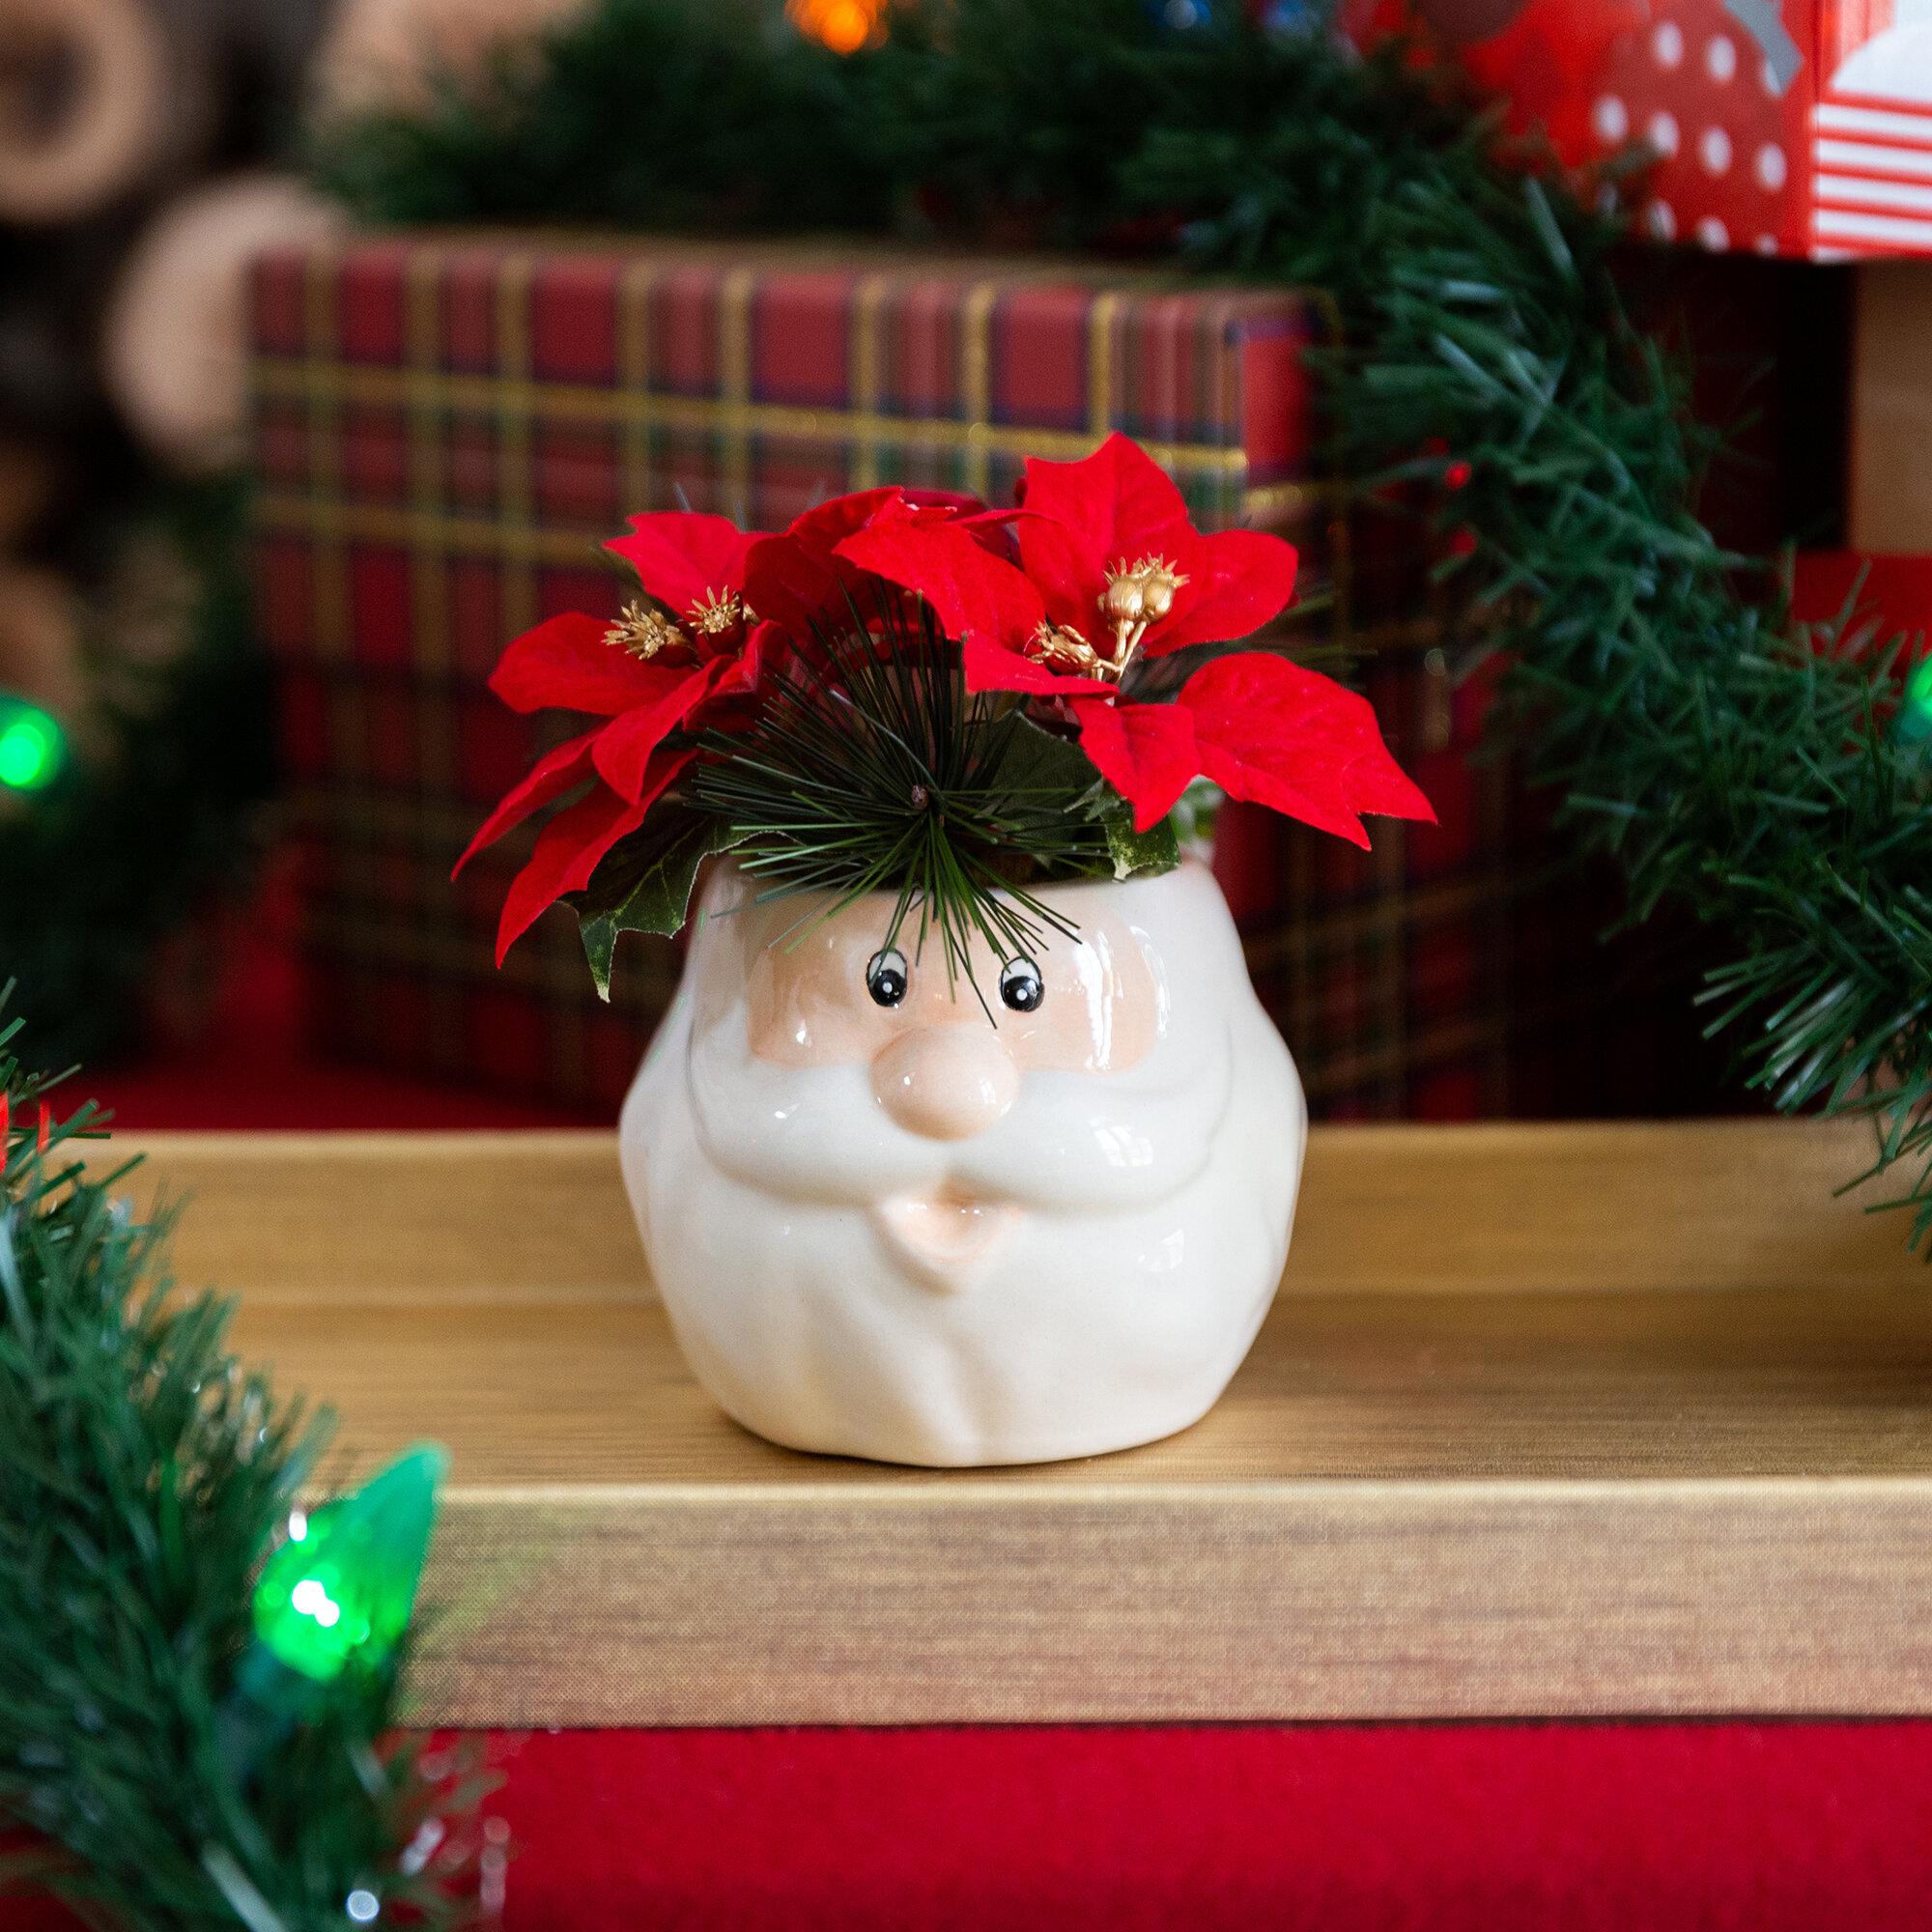 The Holiday Aisle Poinsettias Floral Arrangement In Ceramic Santa Pot Reviews Wayfair